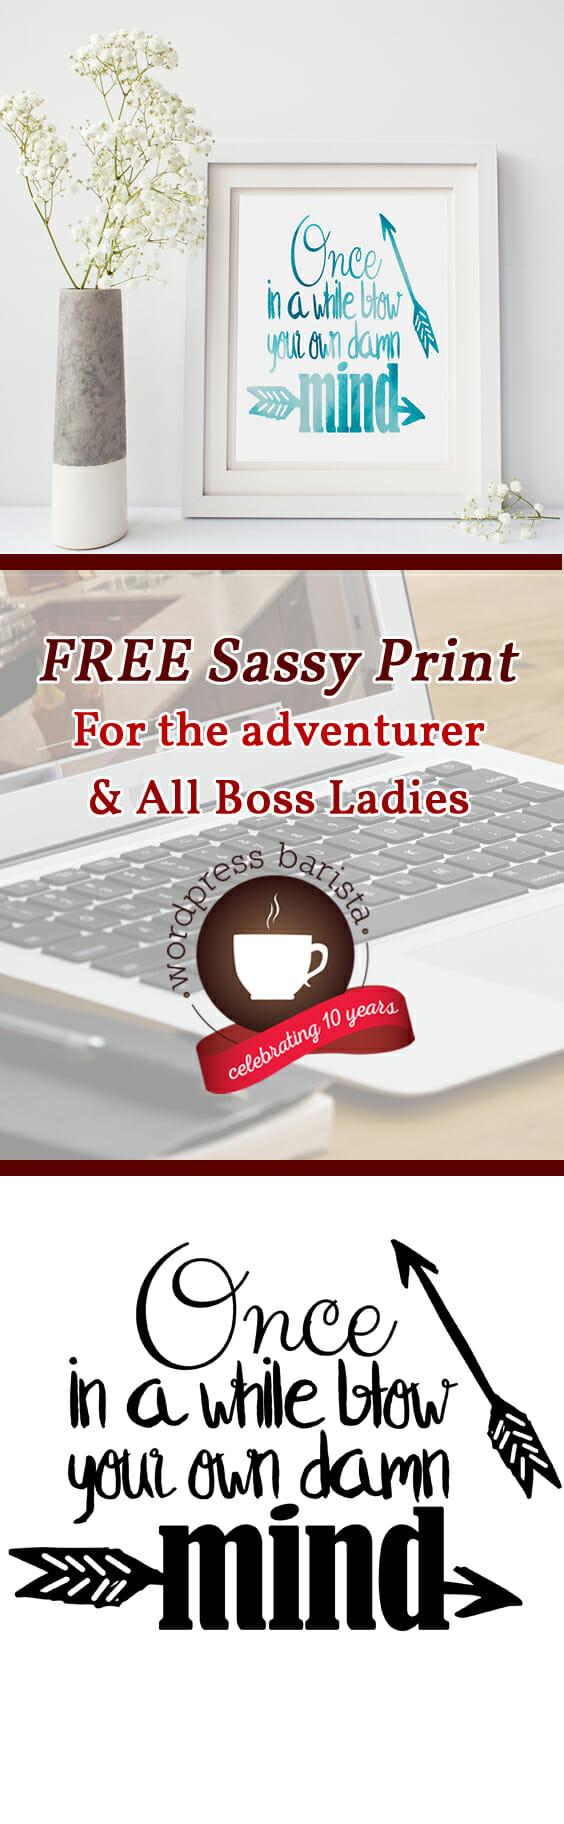 Free Sassy Prints